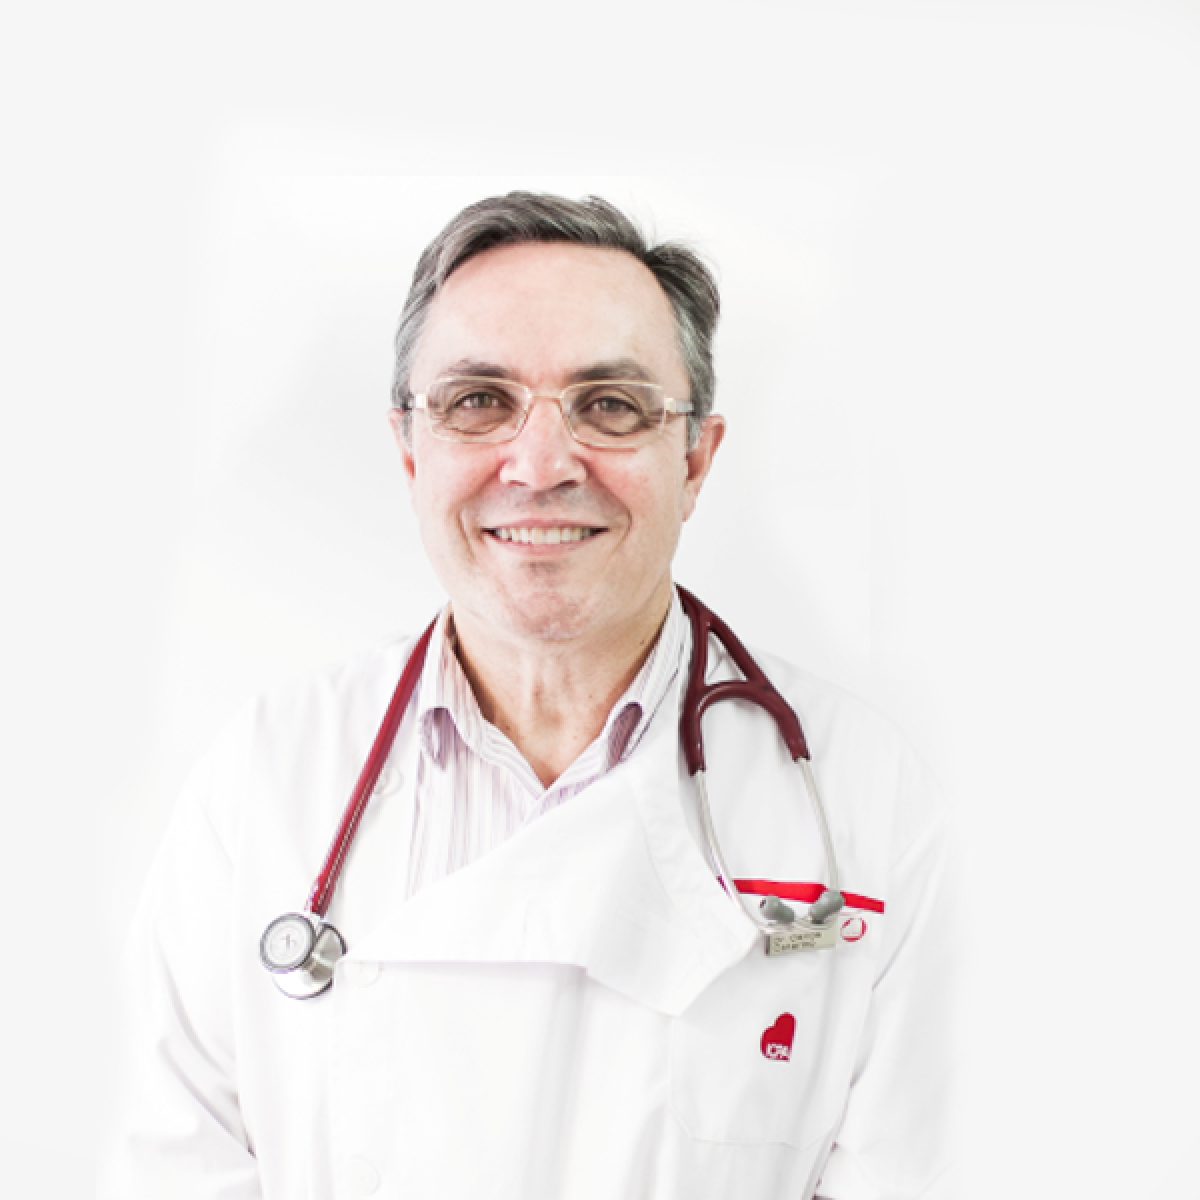 Dr. Carlos Catarino